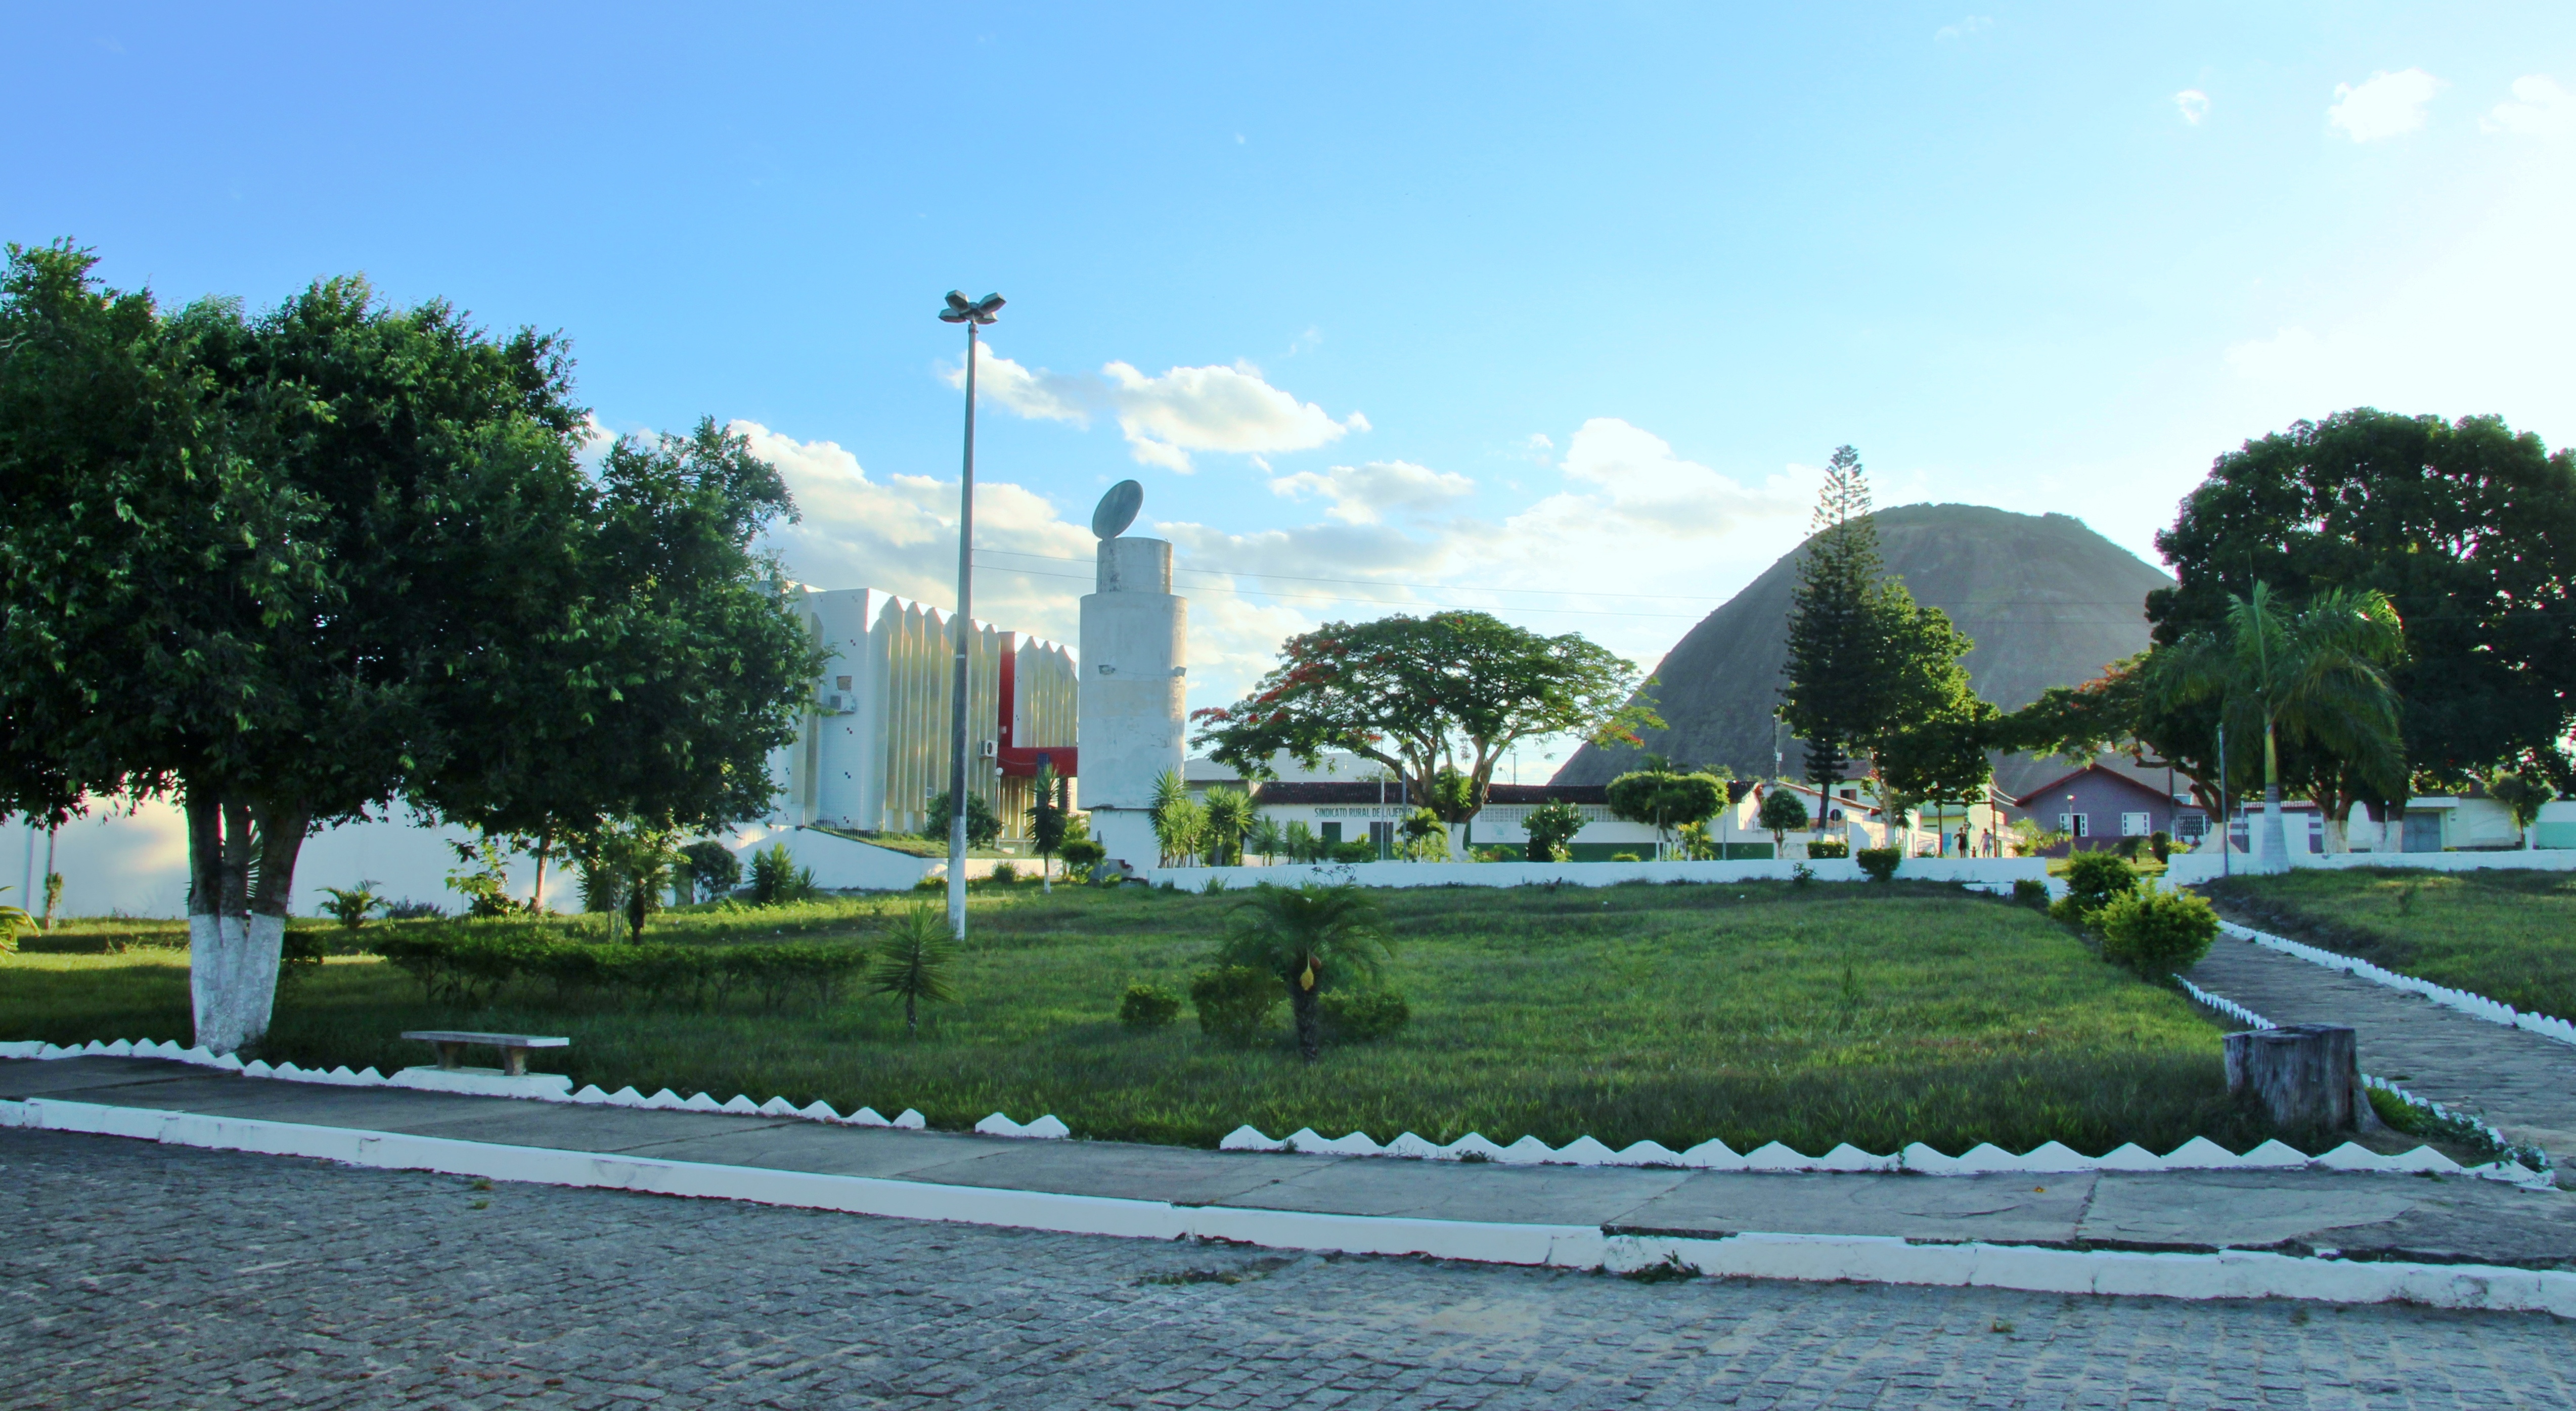 Lajedão Bahia fonte: upload.wikimedia.org